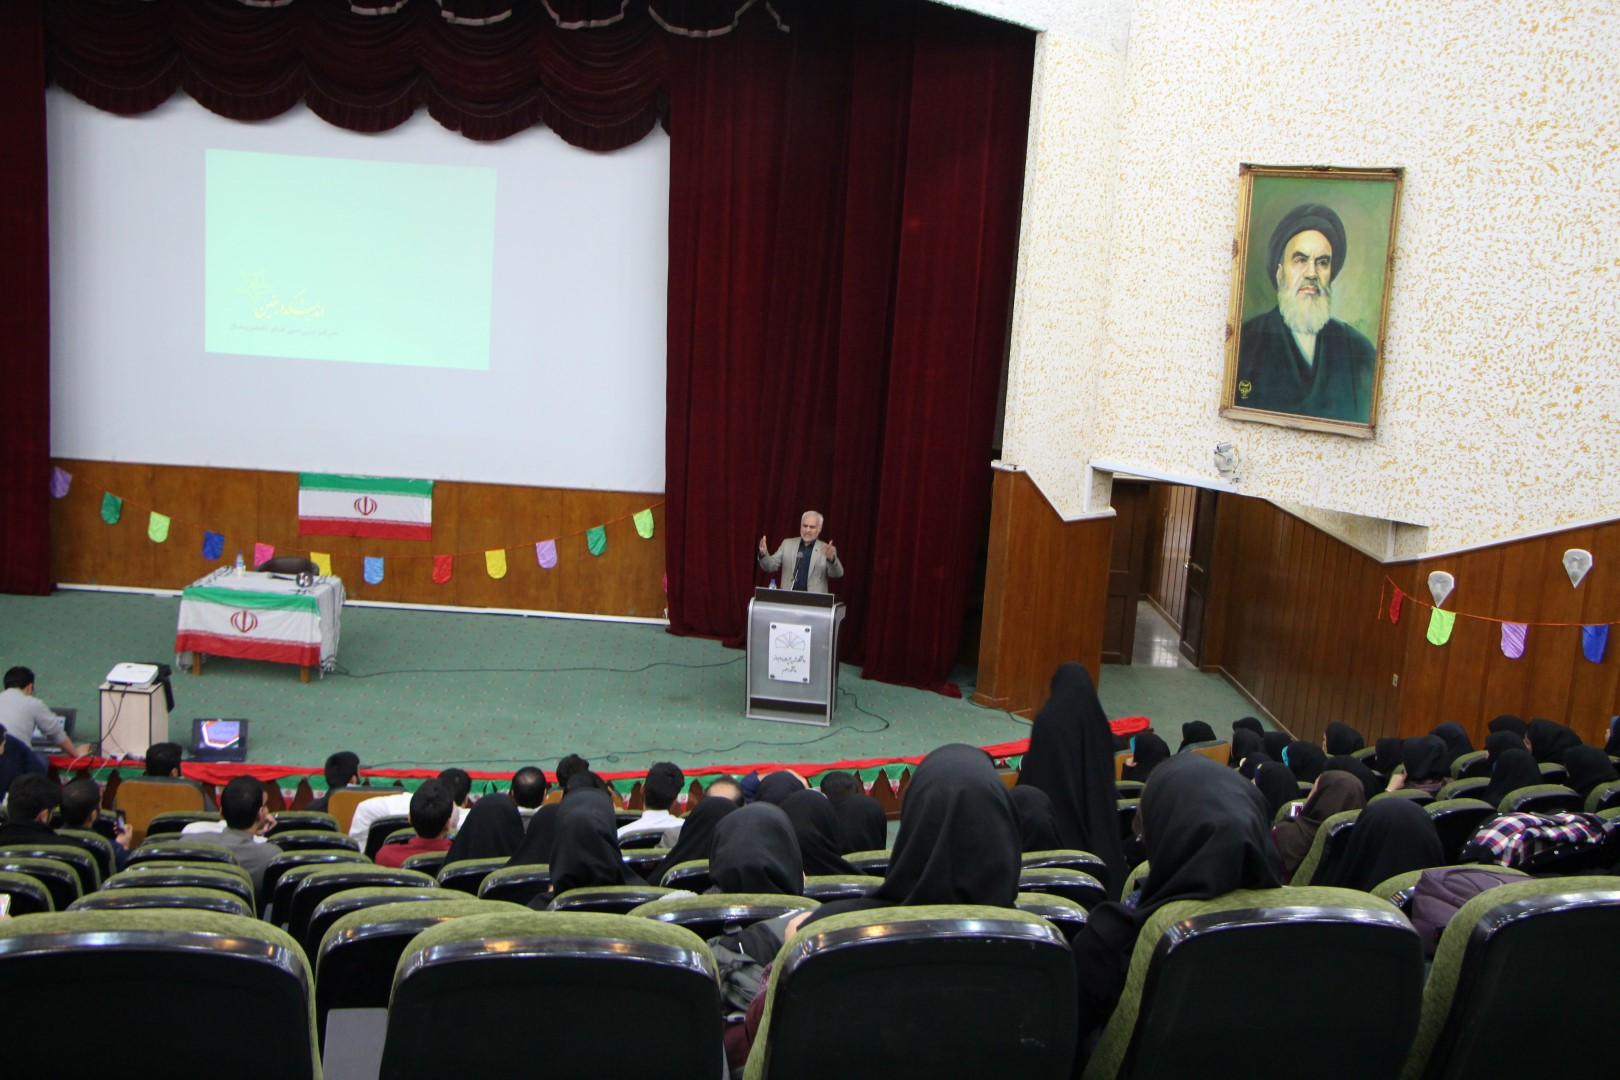 IMG 5266 گزارش تصویری؛ سخنرانی استاد حسن عباسی با موضوع از چوئن لای تا سیاست درهای باز